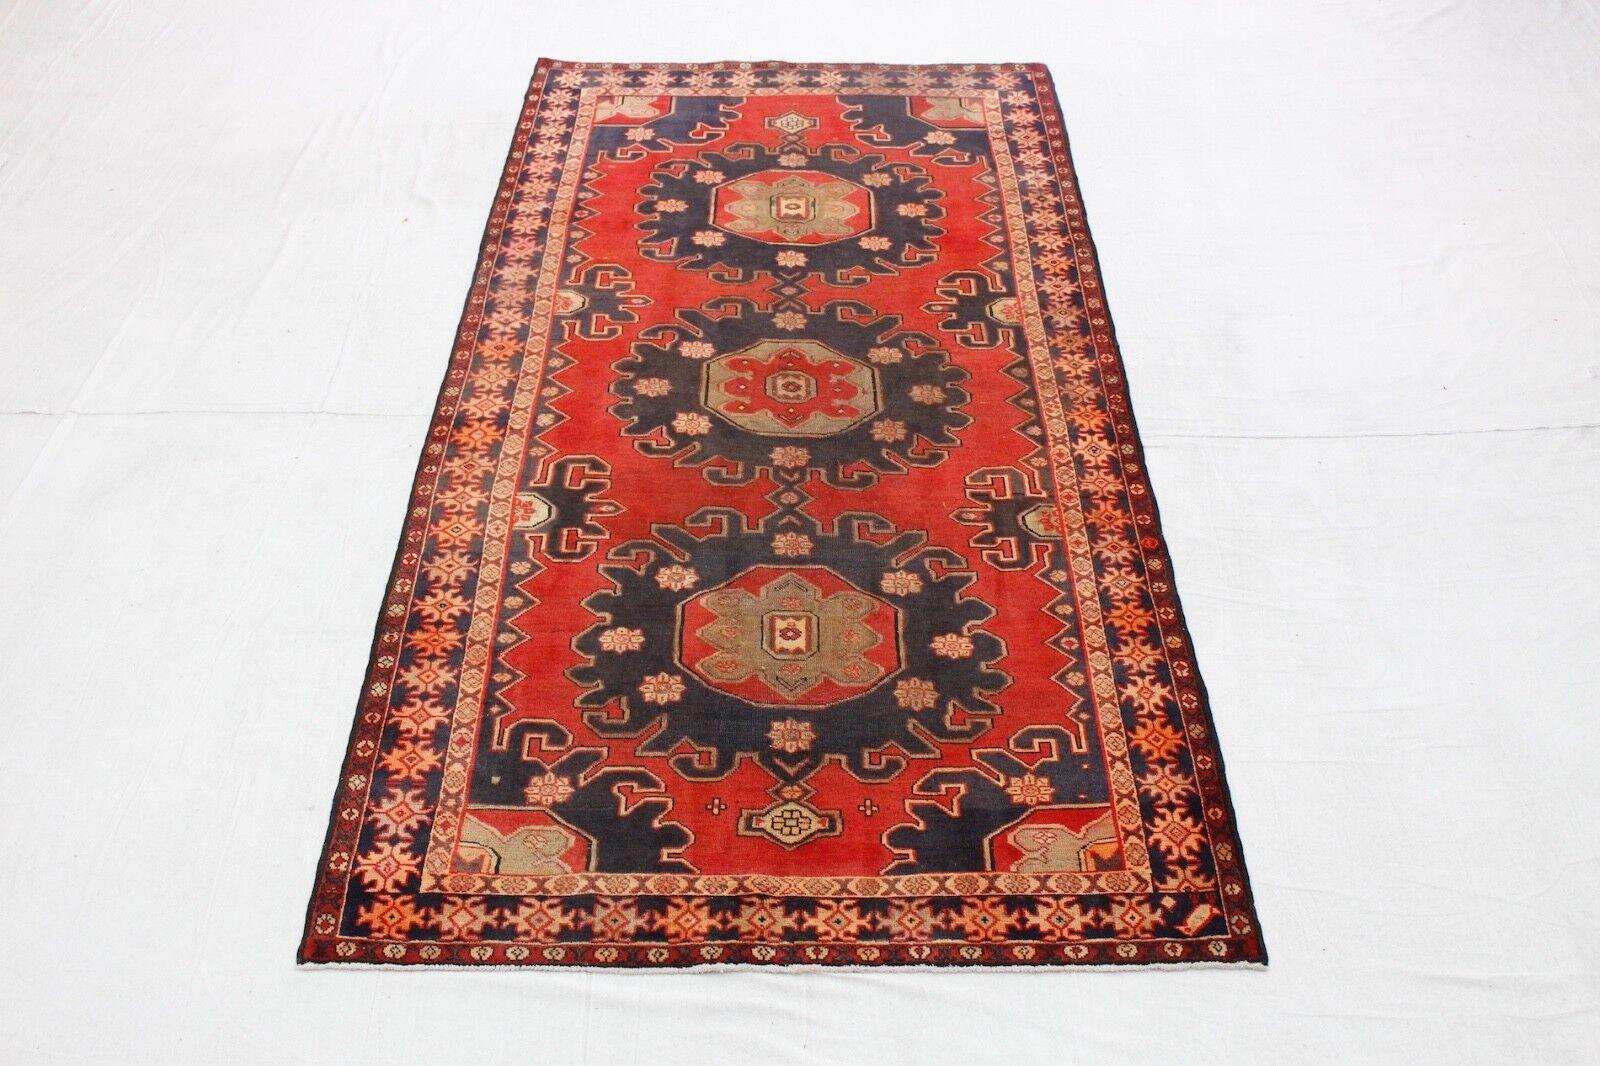 Subalmacén de venta alfombra persa Hamadan clásico 240x160 hecha Carpet KL 3935